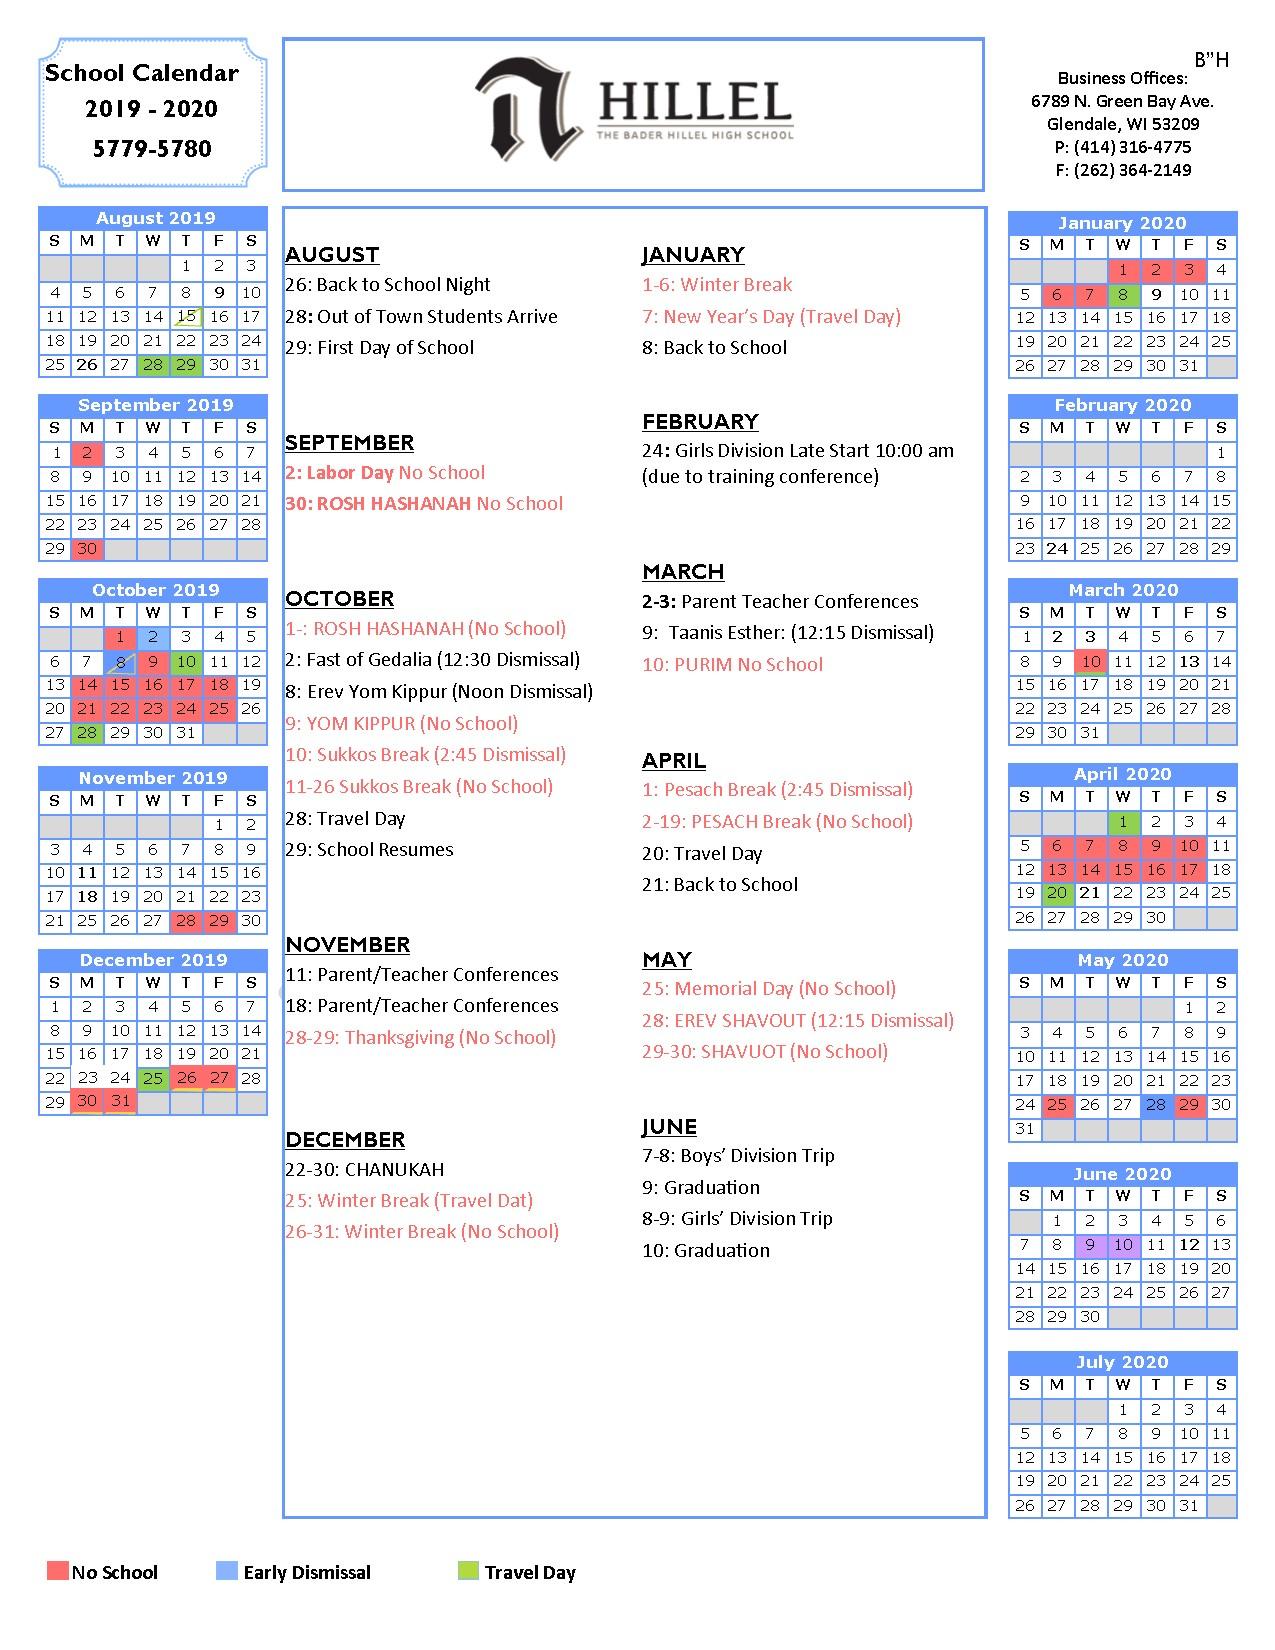 School District 93 Calendar For 2020  2021   Printable Inside Smithtown School Calendar 2021 20